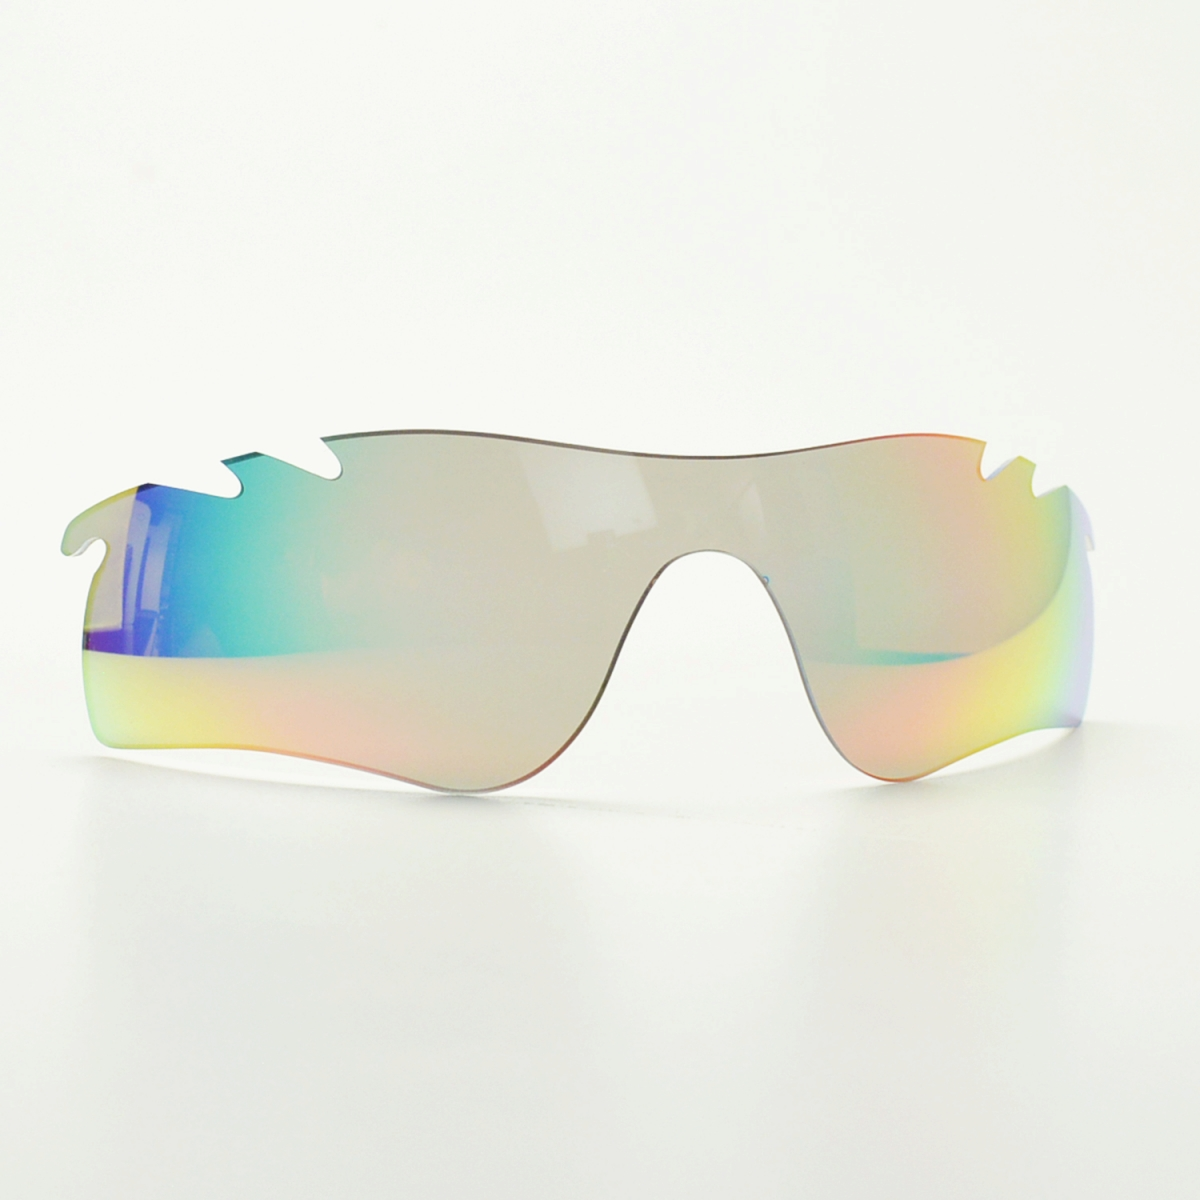 GOODMAN LENS MANUFACTURE グッドマンレンズマニュファクチュア RADARLOCK用交換レンズ 偏光ライトグレー レッドミラーGOODMAN LENS MANUFACTURE グッドマンレンズマニュファクチュア レンズ 調光 偏光 OAKLEY オークリー 交換レンズ